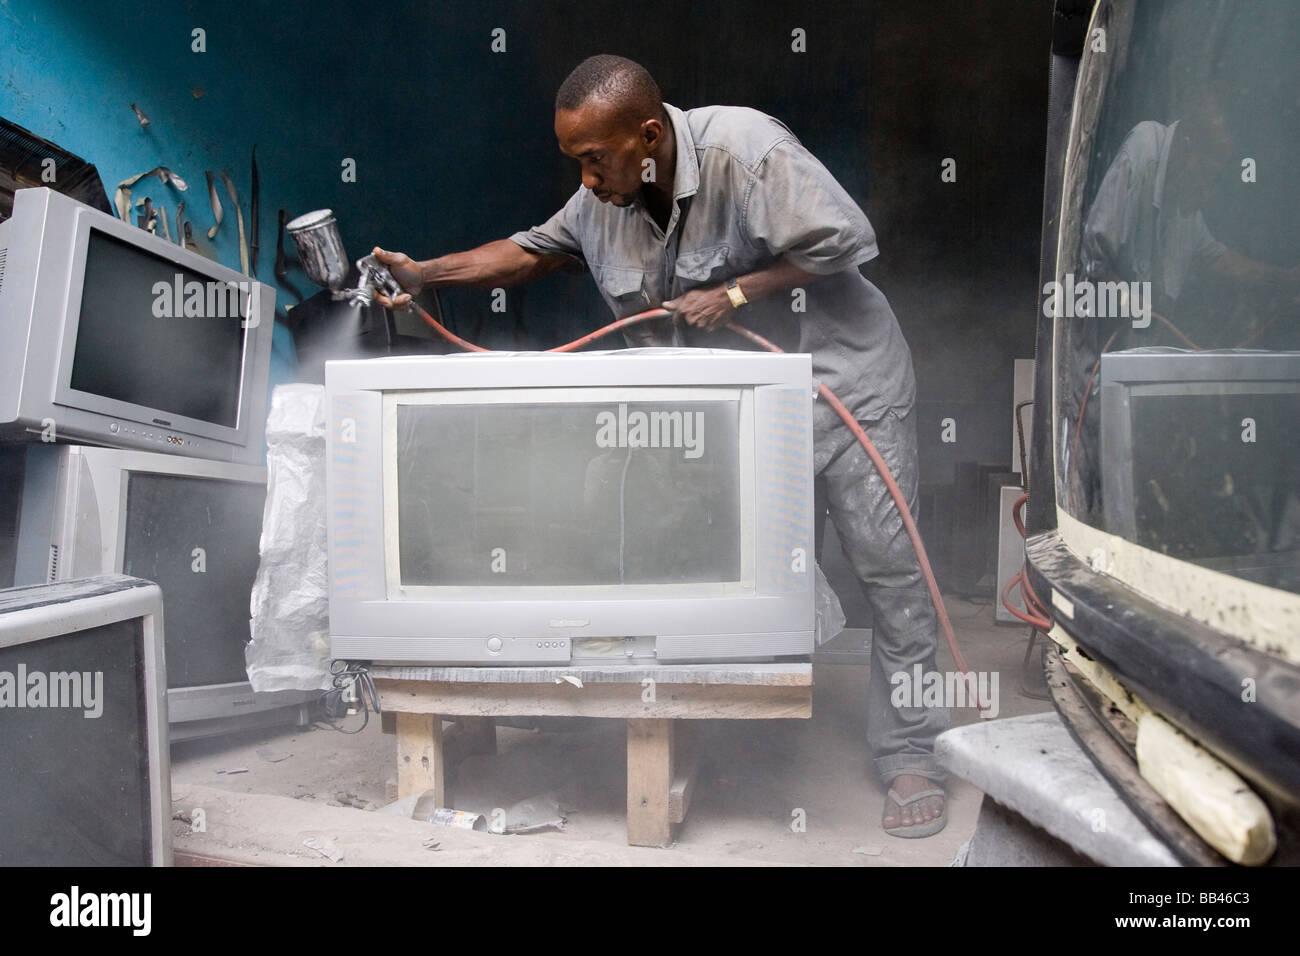 Electronics market in Lagos, Nigeria - Stock Image